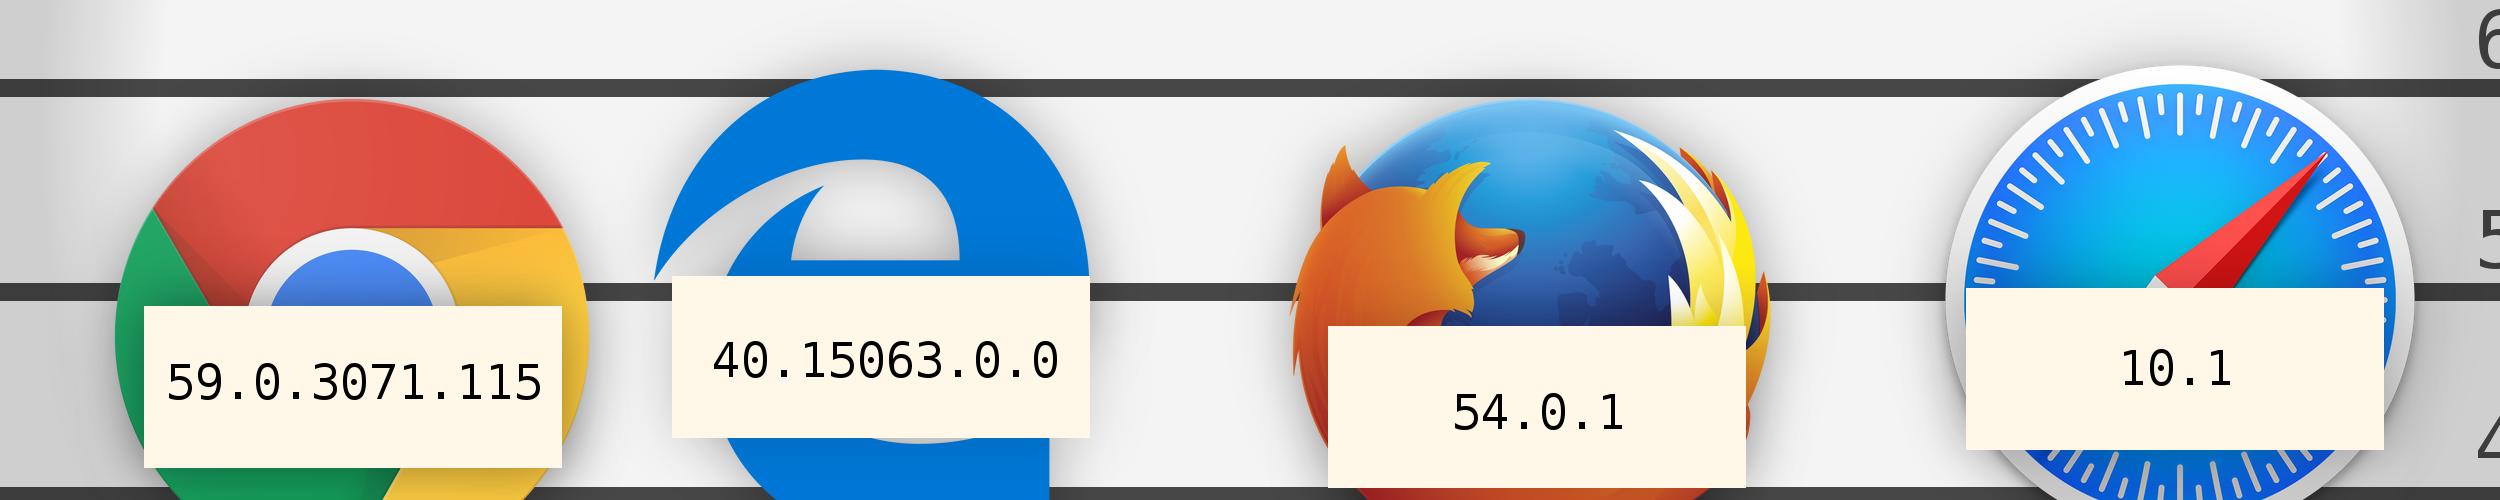 A lineup of browser logos